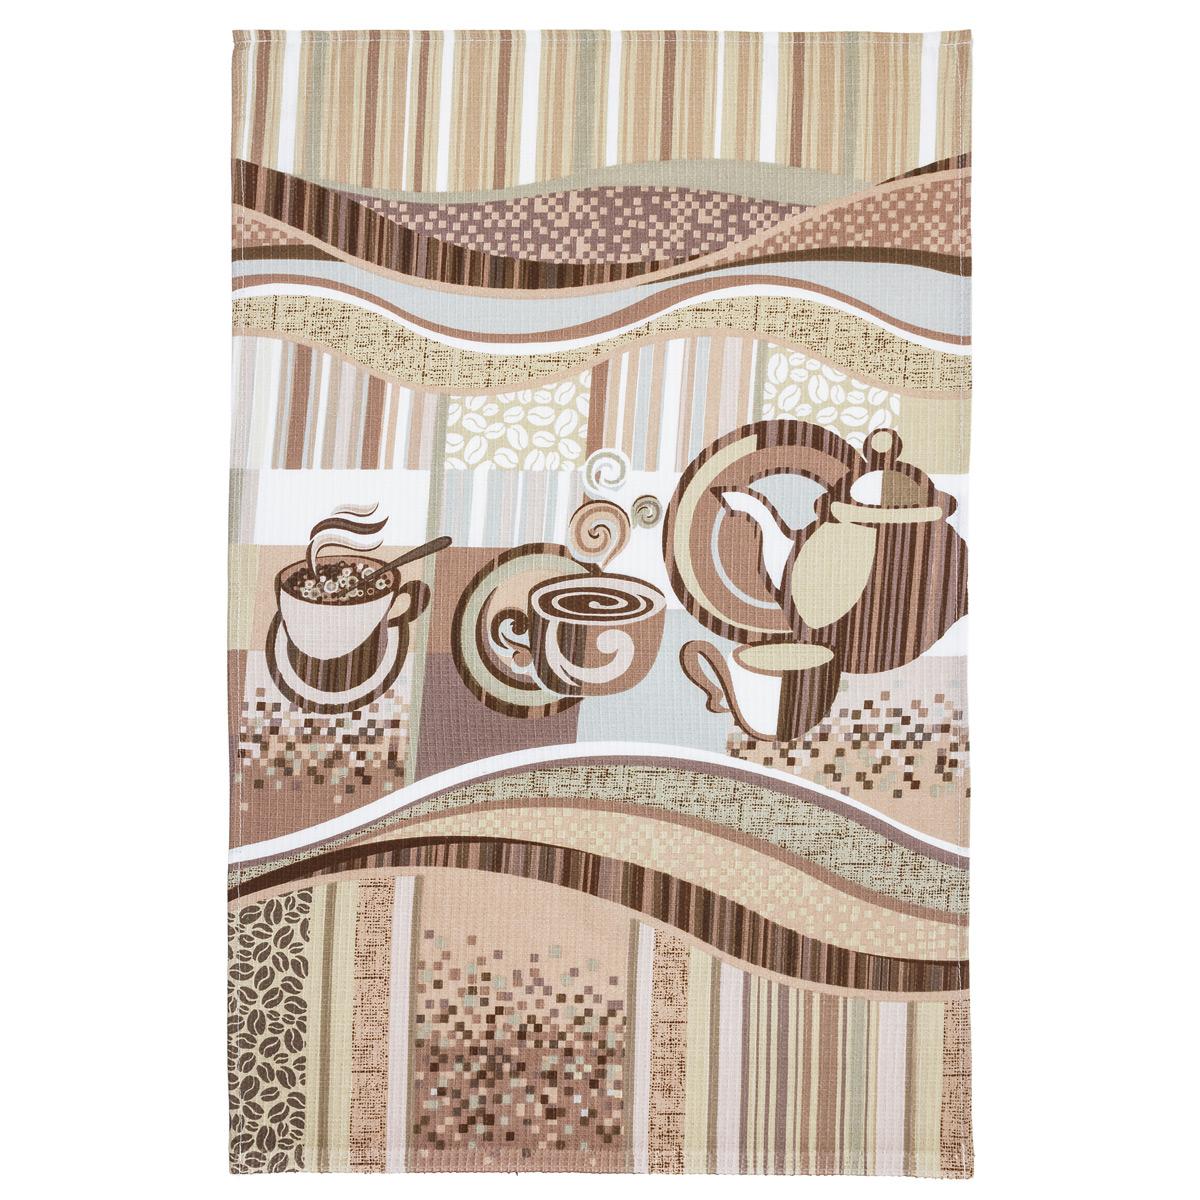 Вафельное полотенце Эспрессо р. 100х150Вафельные полотенца<br>Плотность:150 г/кв. м<br><br>Тип: Вафельное полотенце<br>Размер: 100х150<br>Материал: Вафельное полотно